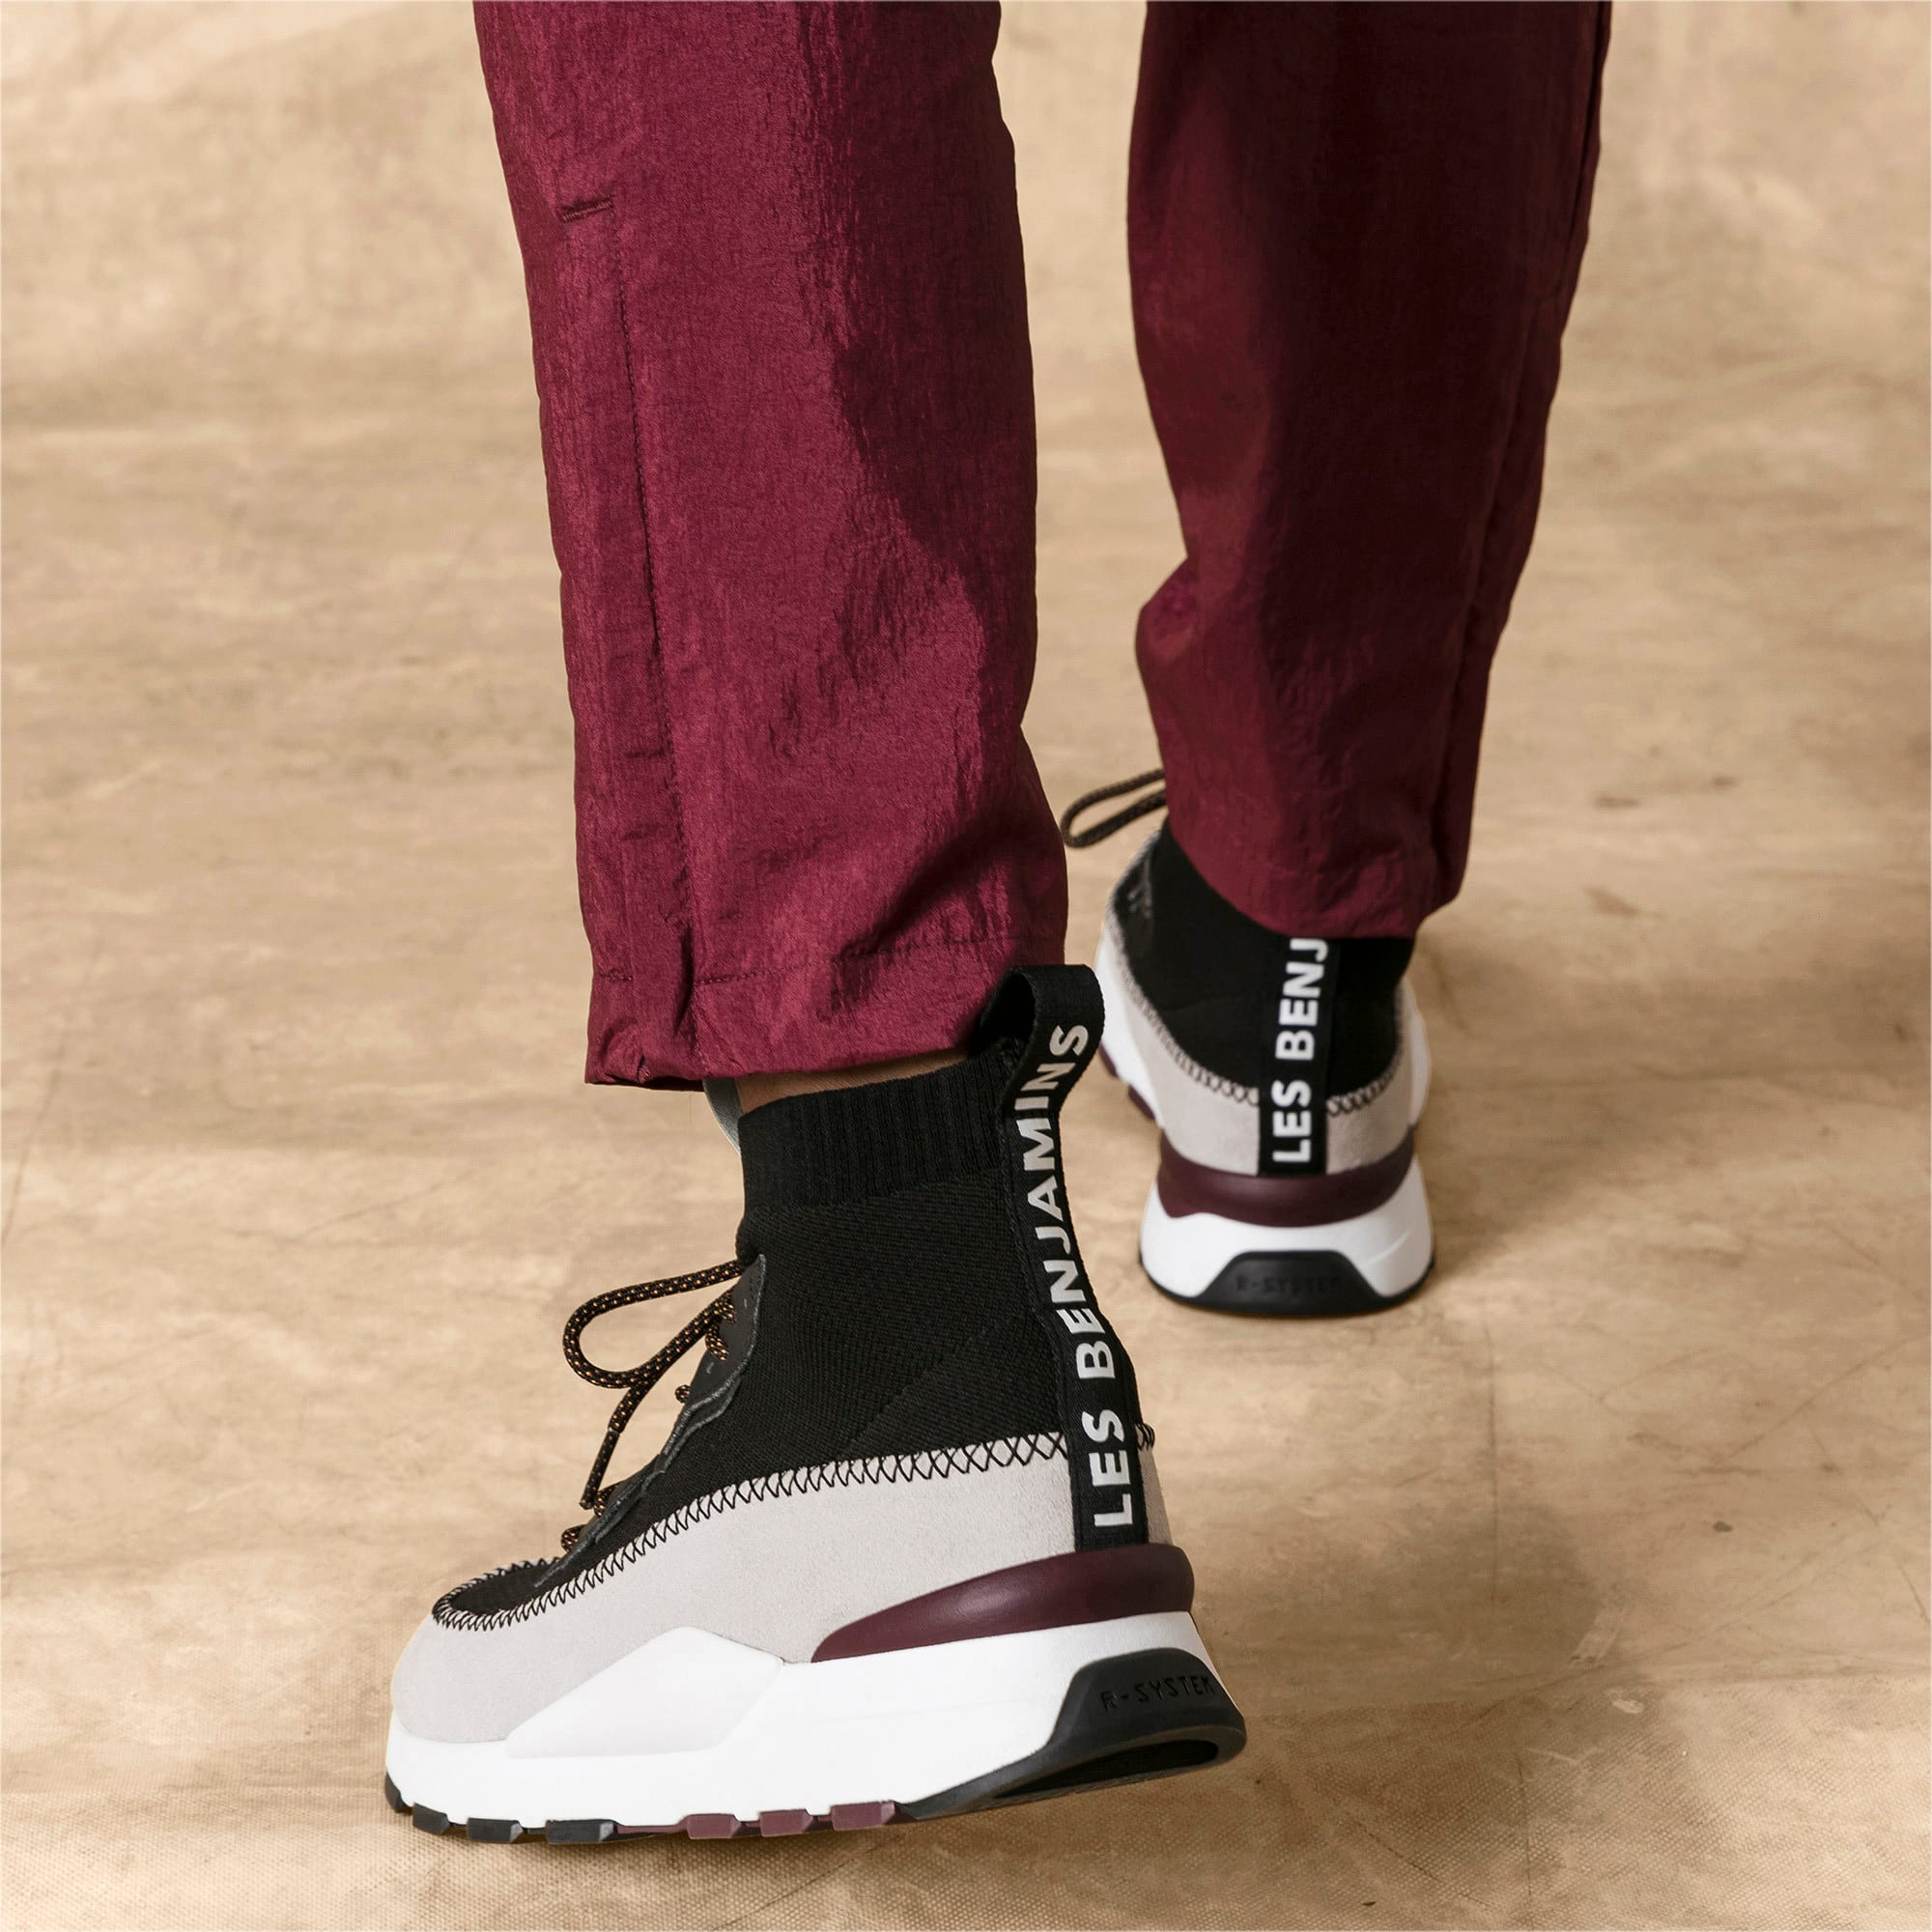 Thumbnail 3 of RS-0 LES BENJAMINS Sneakers, Puma White-Puma Black, medium